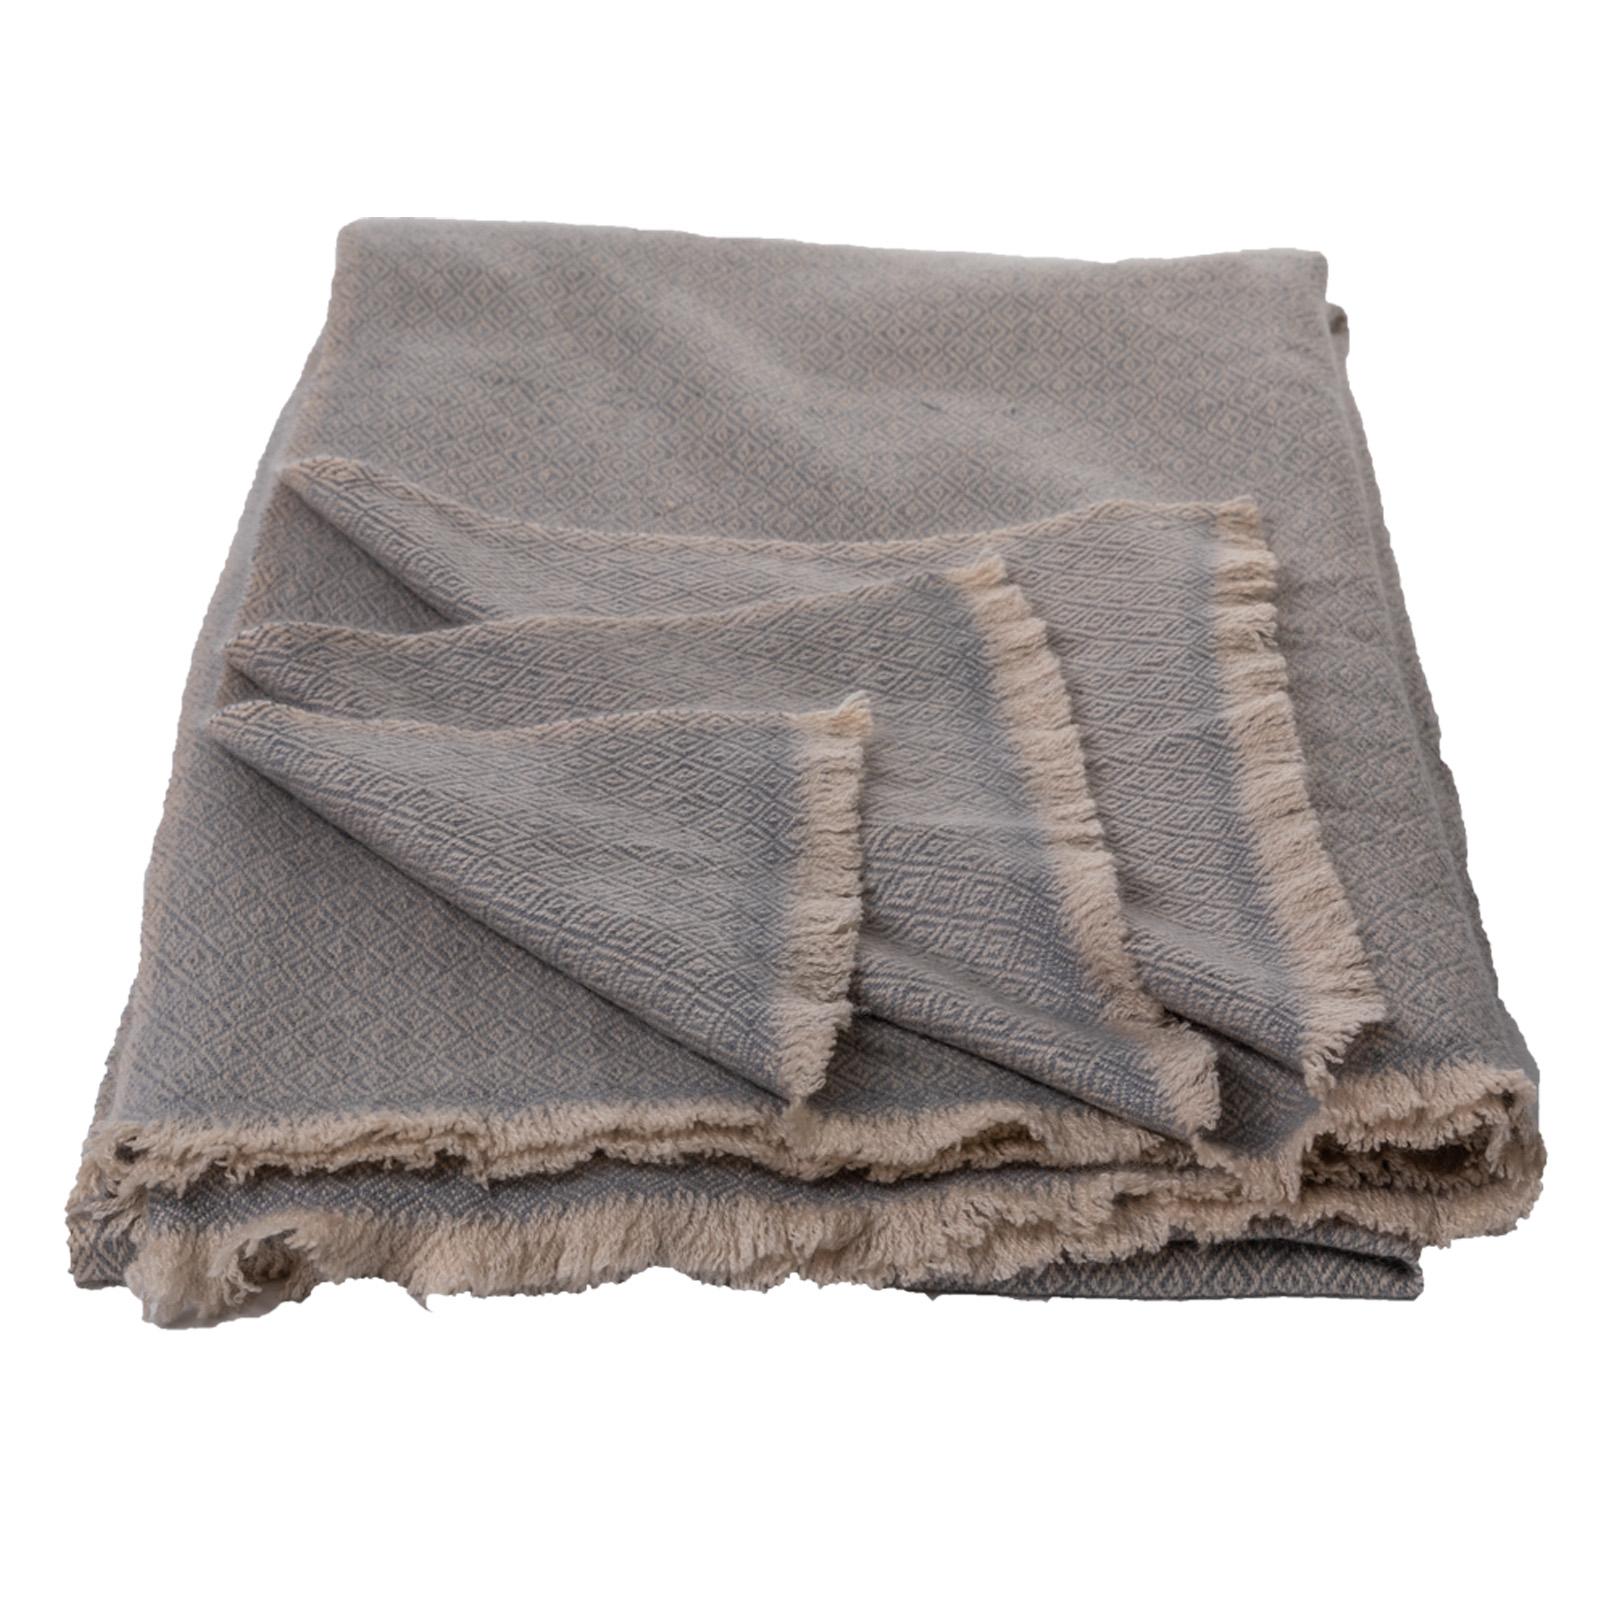 Cashmere-Decke  grau/natur aus Nepal  140x200 cm